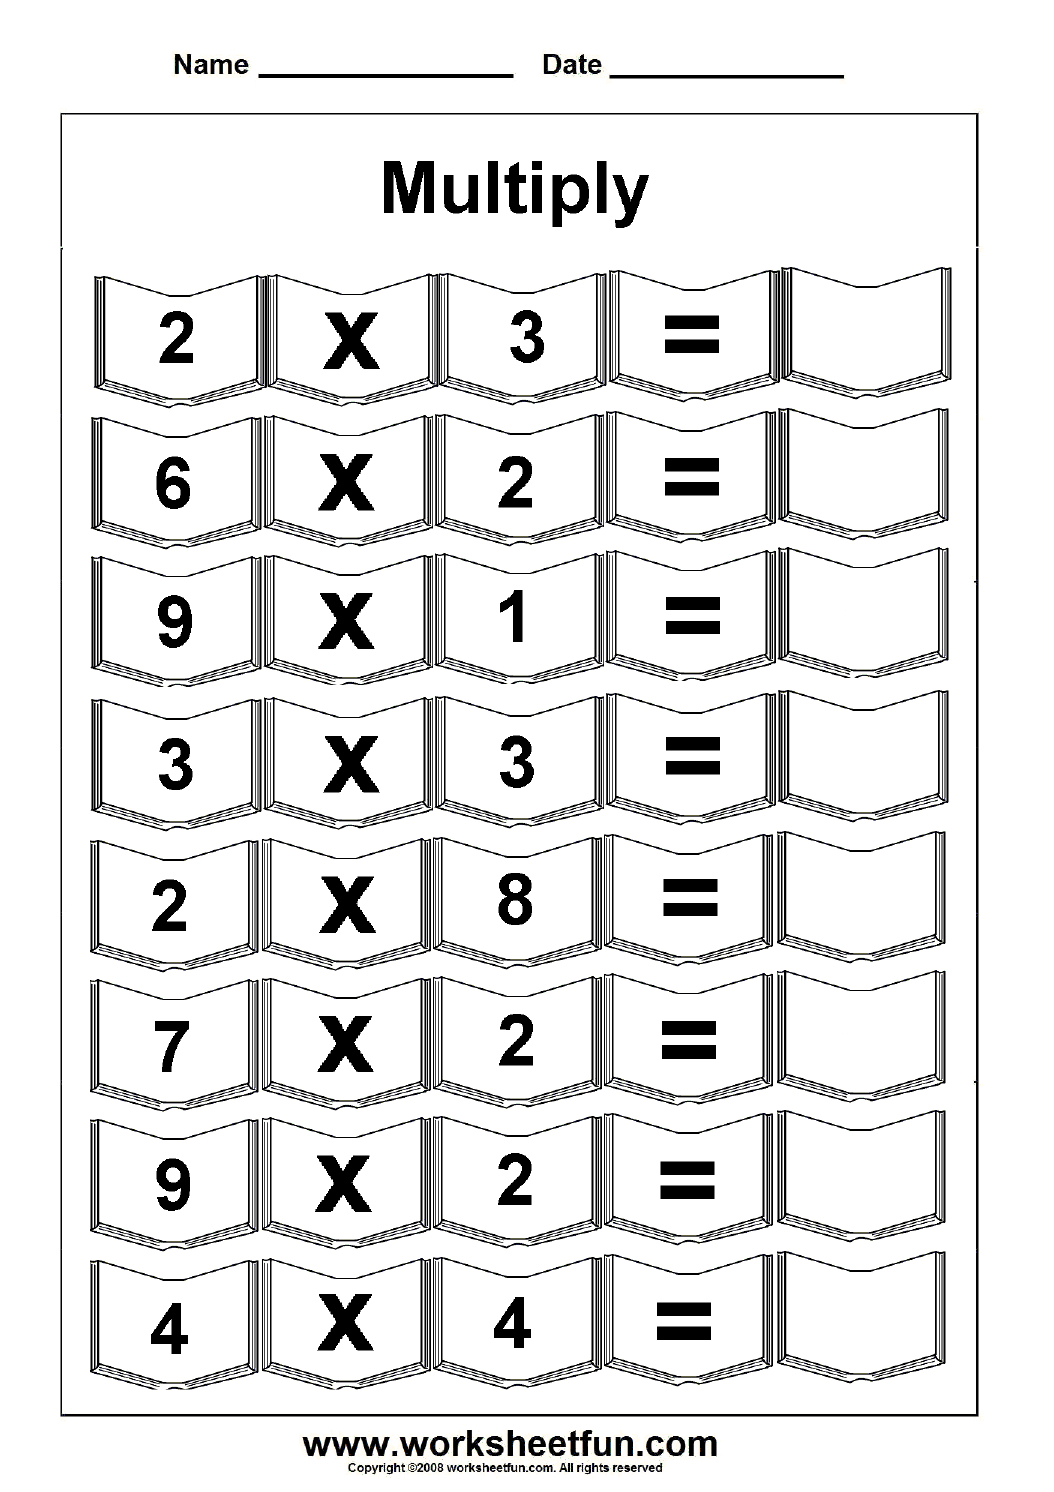 Multiplication – 5 Worksheets  Free Printable Worksheets – Worksheetfun Or Th Worksheets Printable